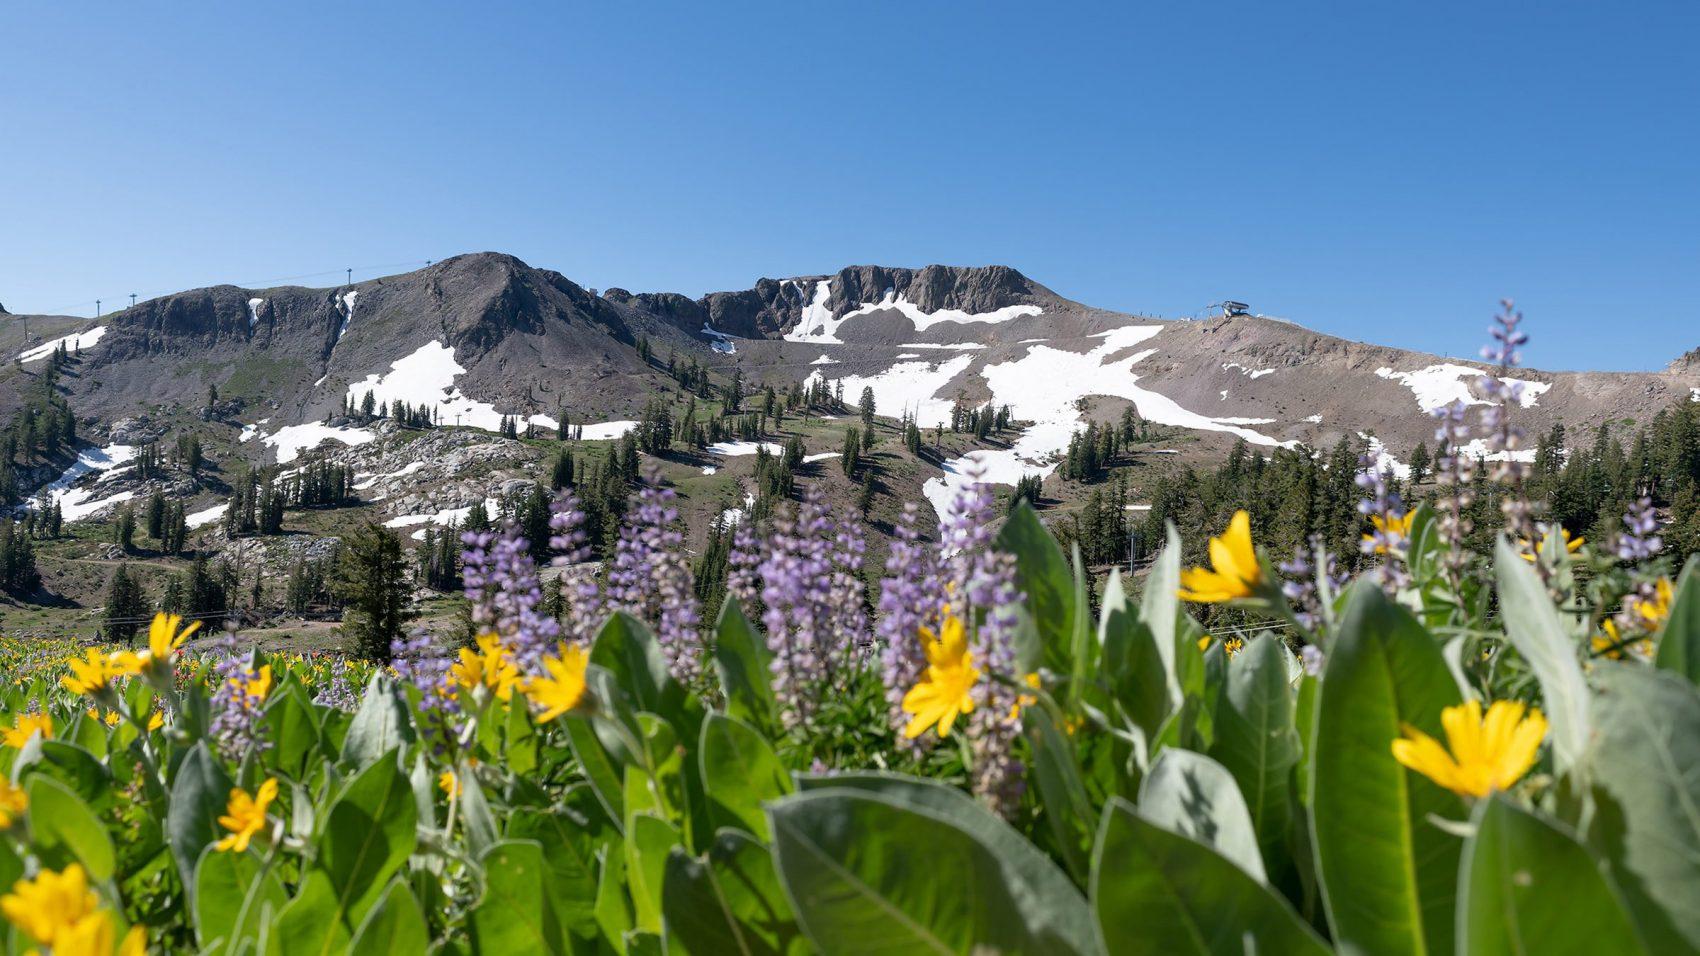 Squaw Valley alpine meadows, Washoe trie, cultural tour, california,